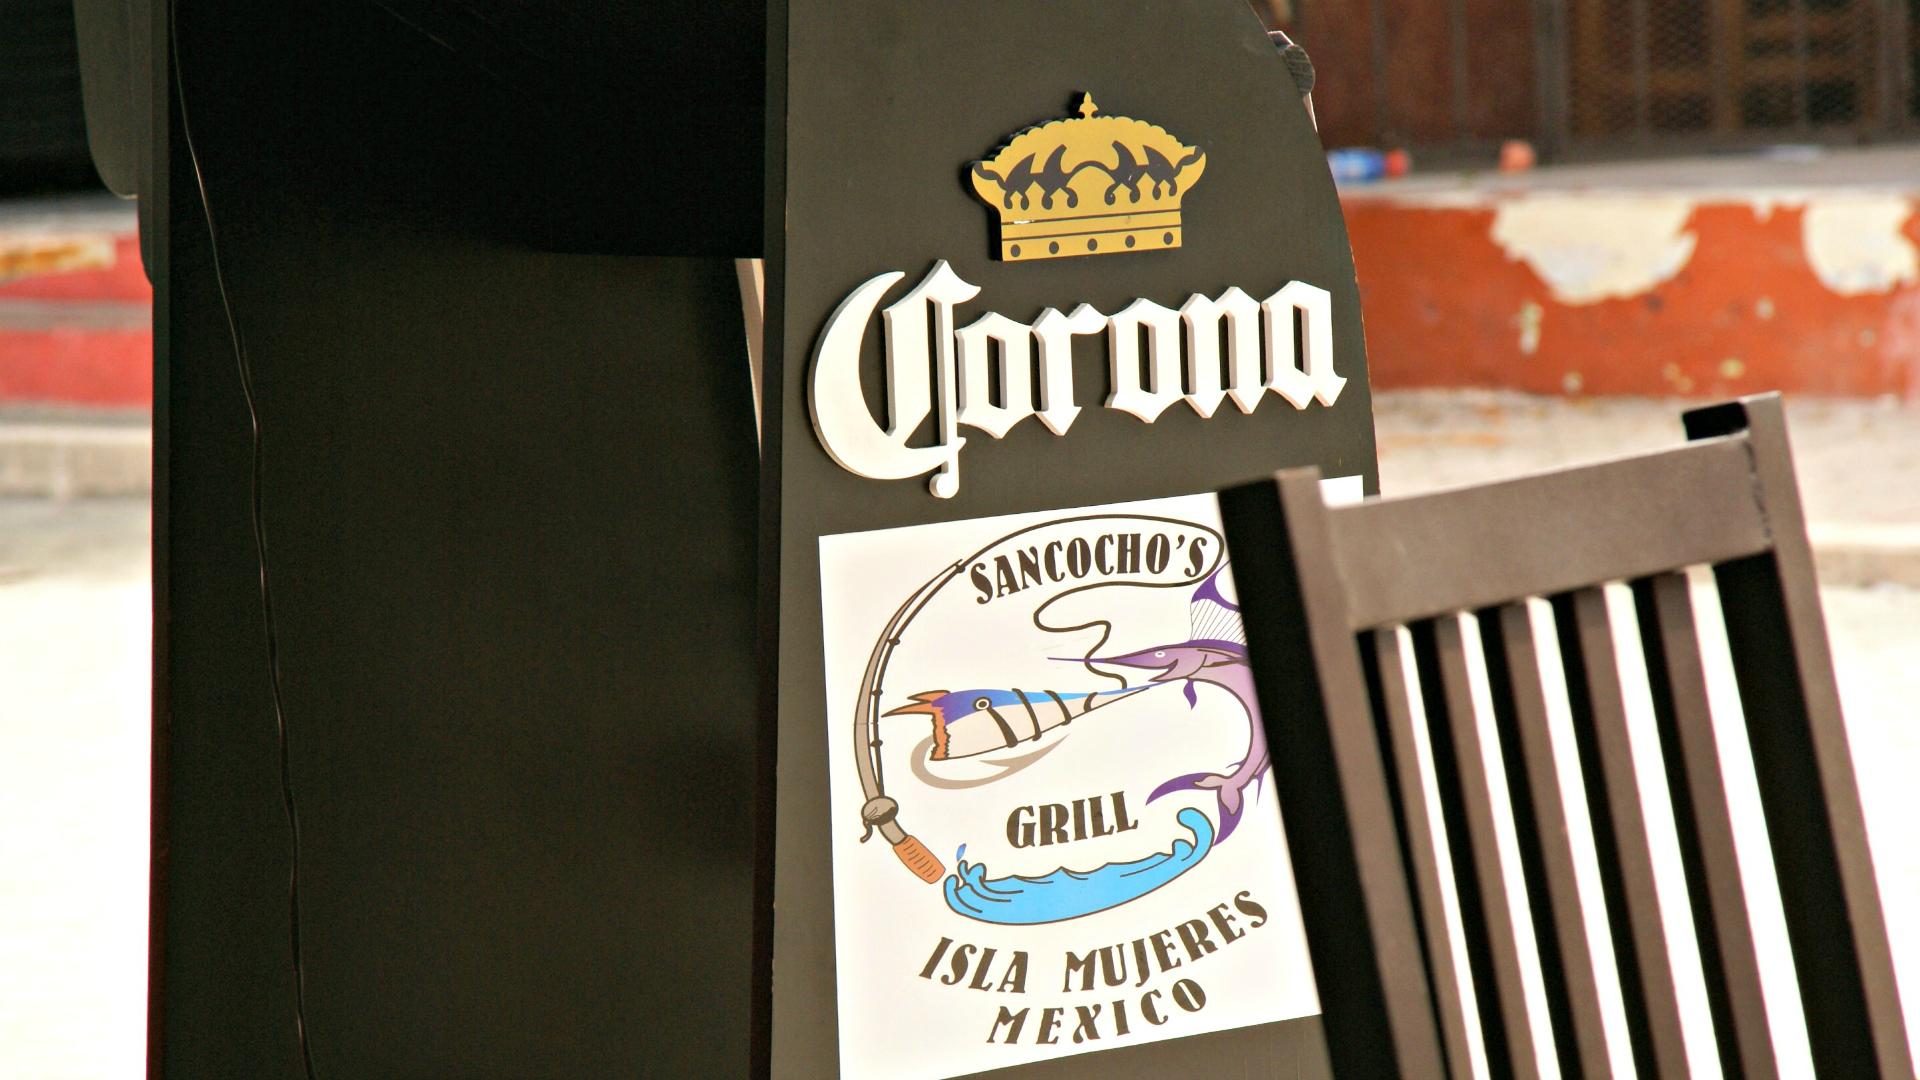 If is Mexico, there's Corona everywhere. Photo by Ovidiu Balaj